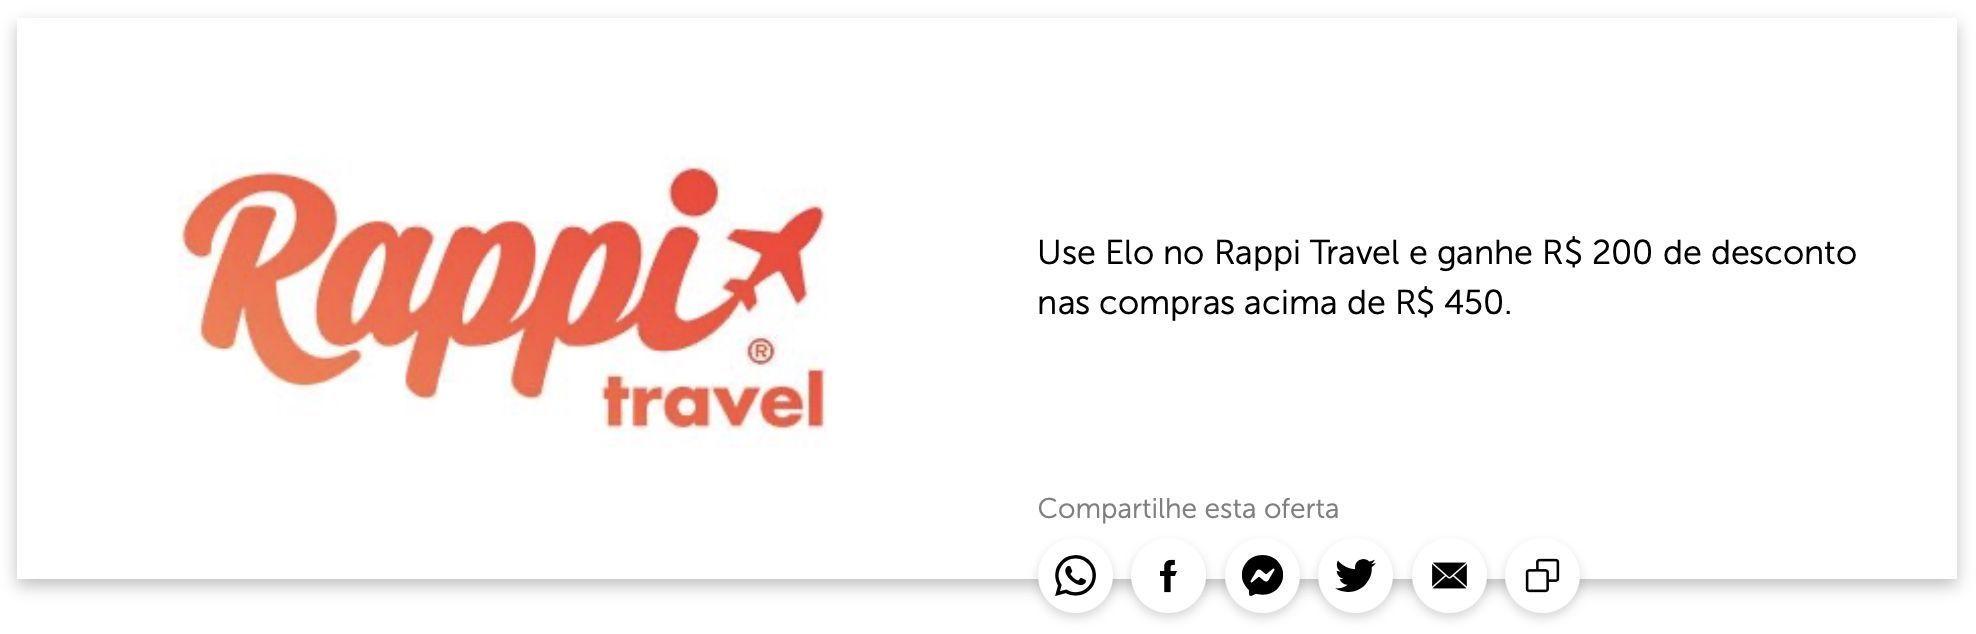 Elo Rappi Travel R$200